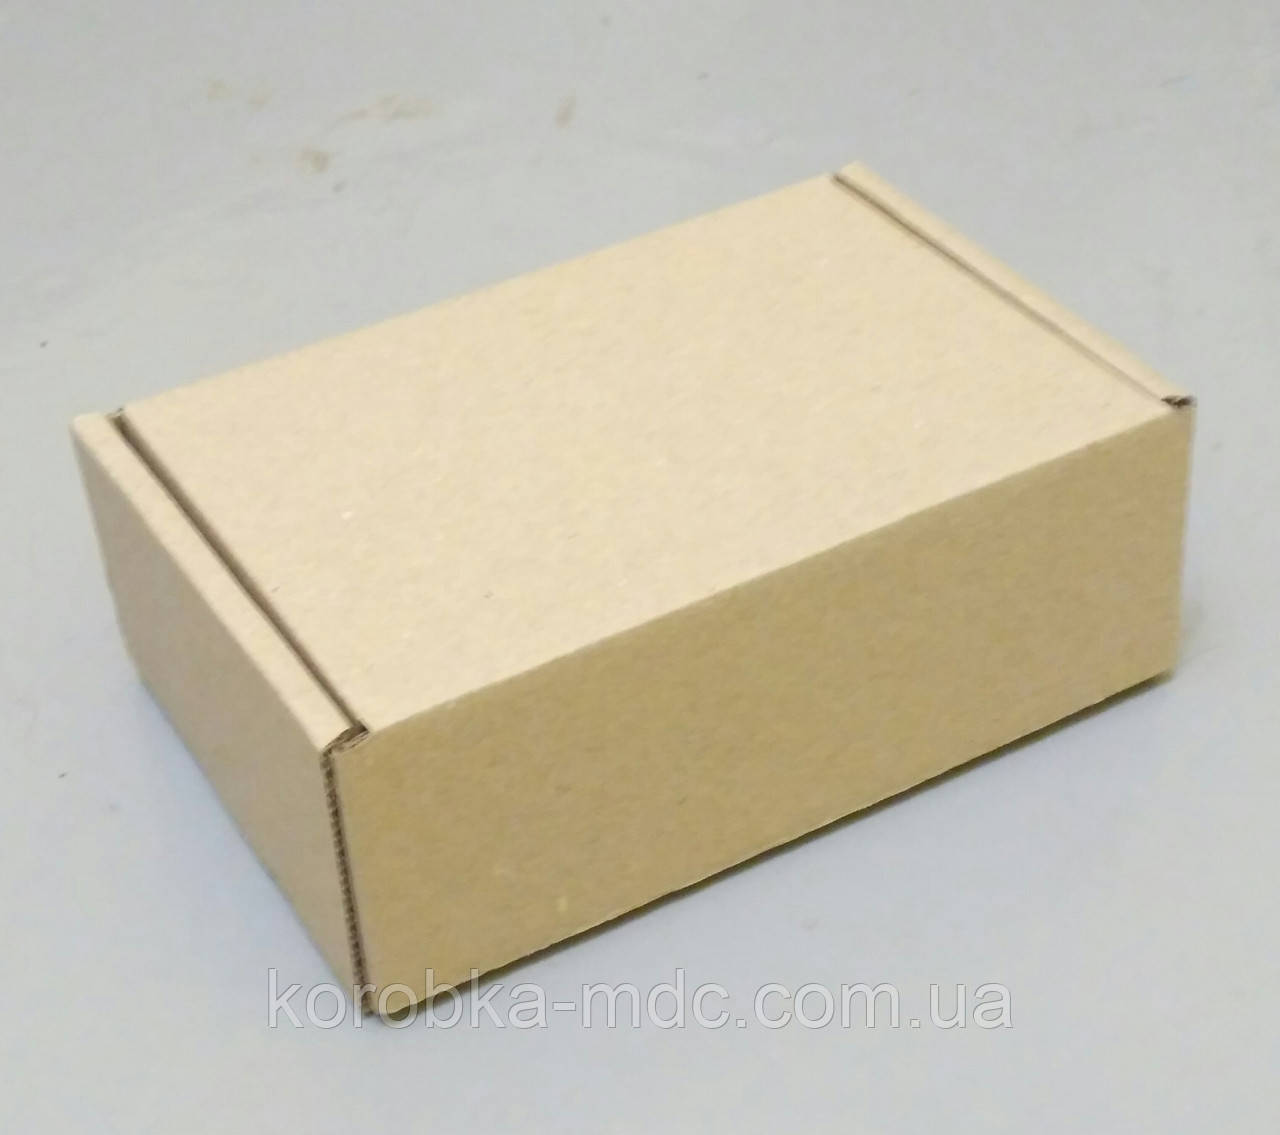 Коробка бурая 150х150х24 самосборная с замком